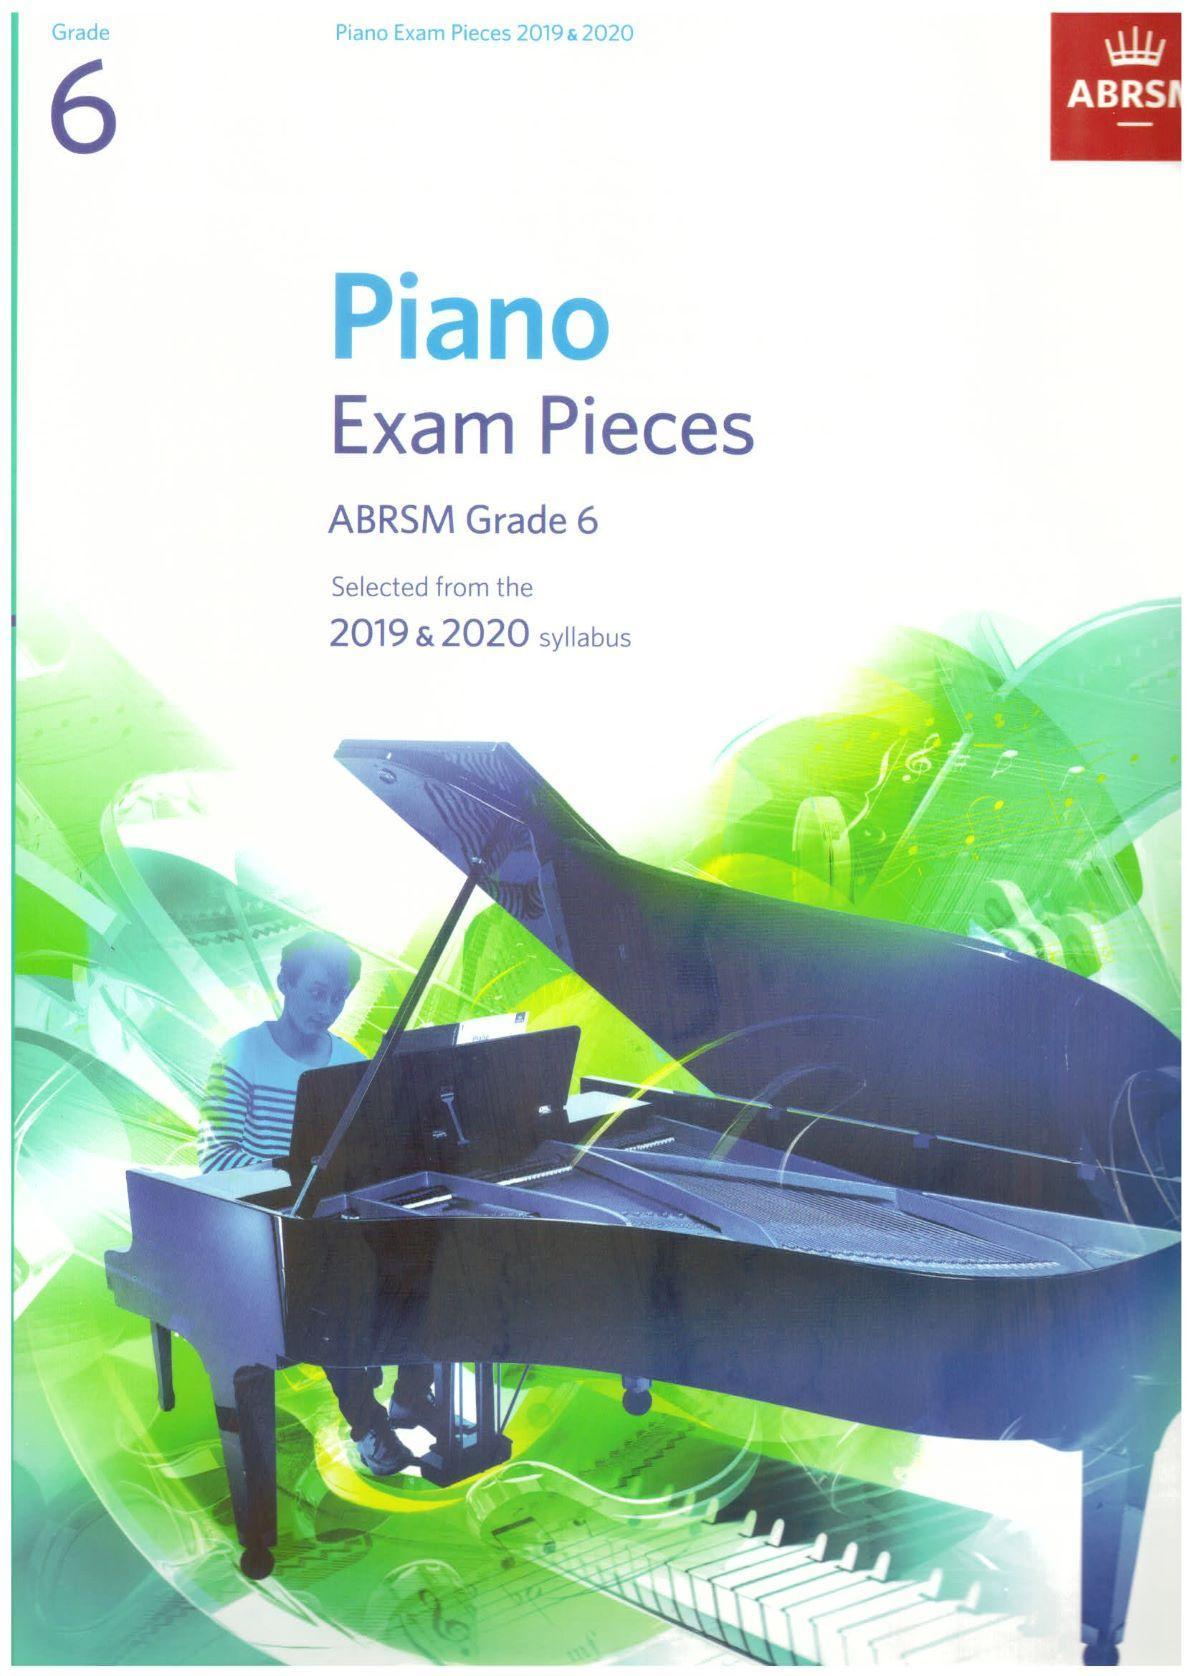 ABRSM Piano Exam Pieces 2019 2020 - Grade 6 (Book Only)